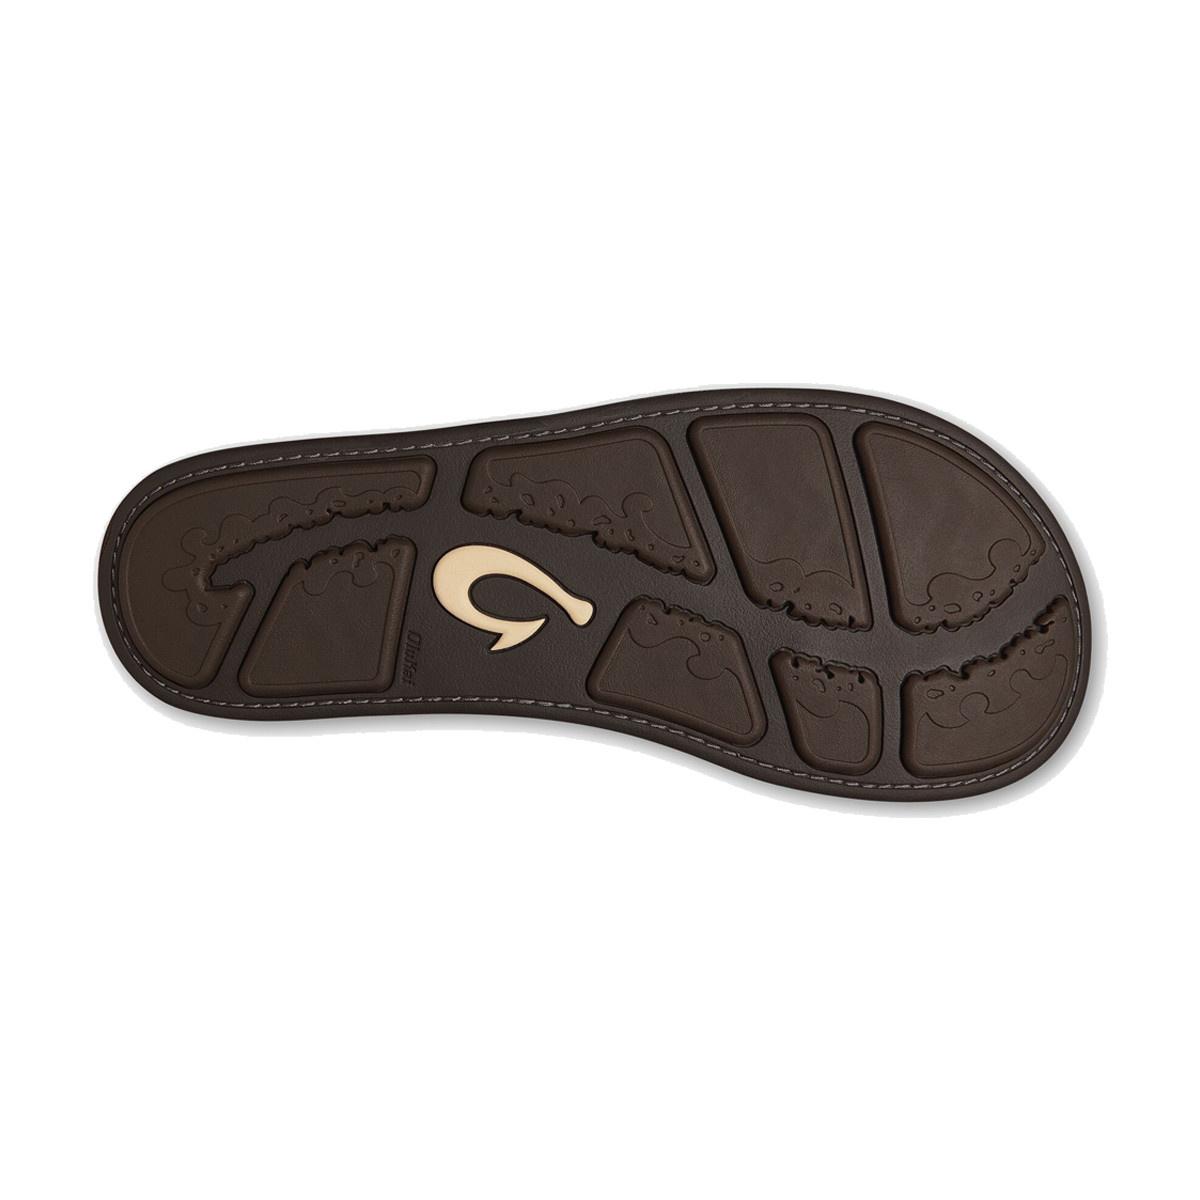 OluKai OluKai Men's Nui Leather Espresso